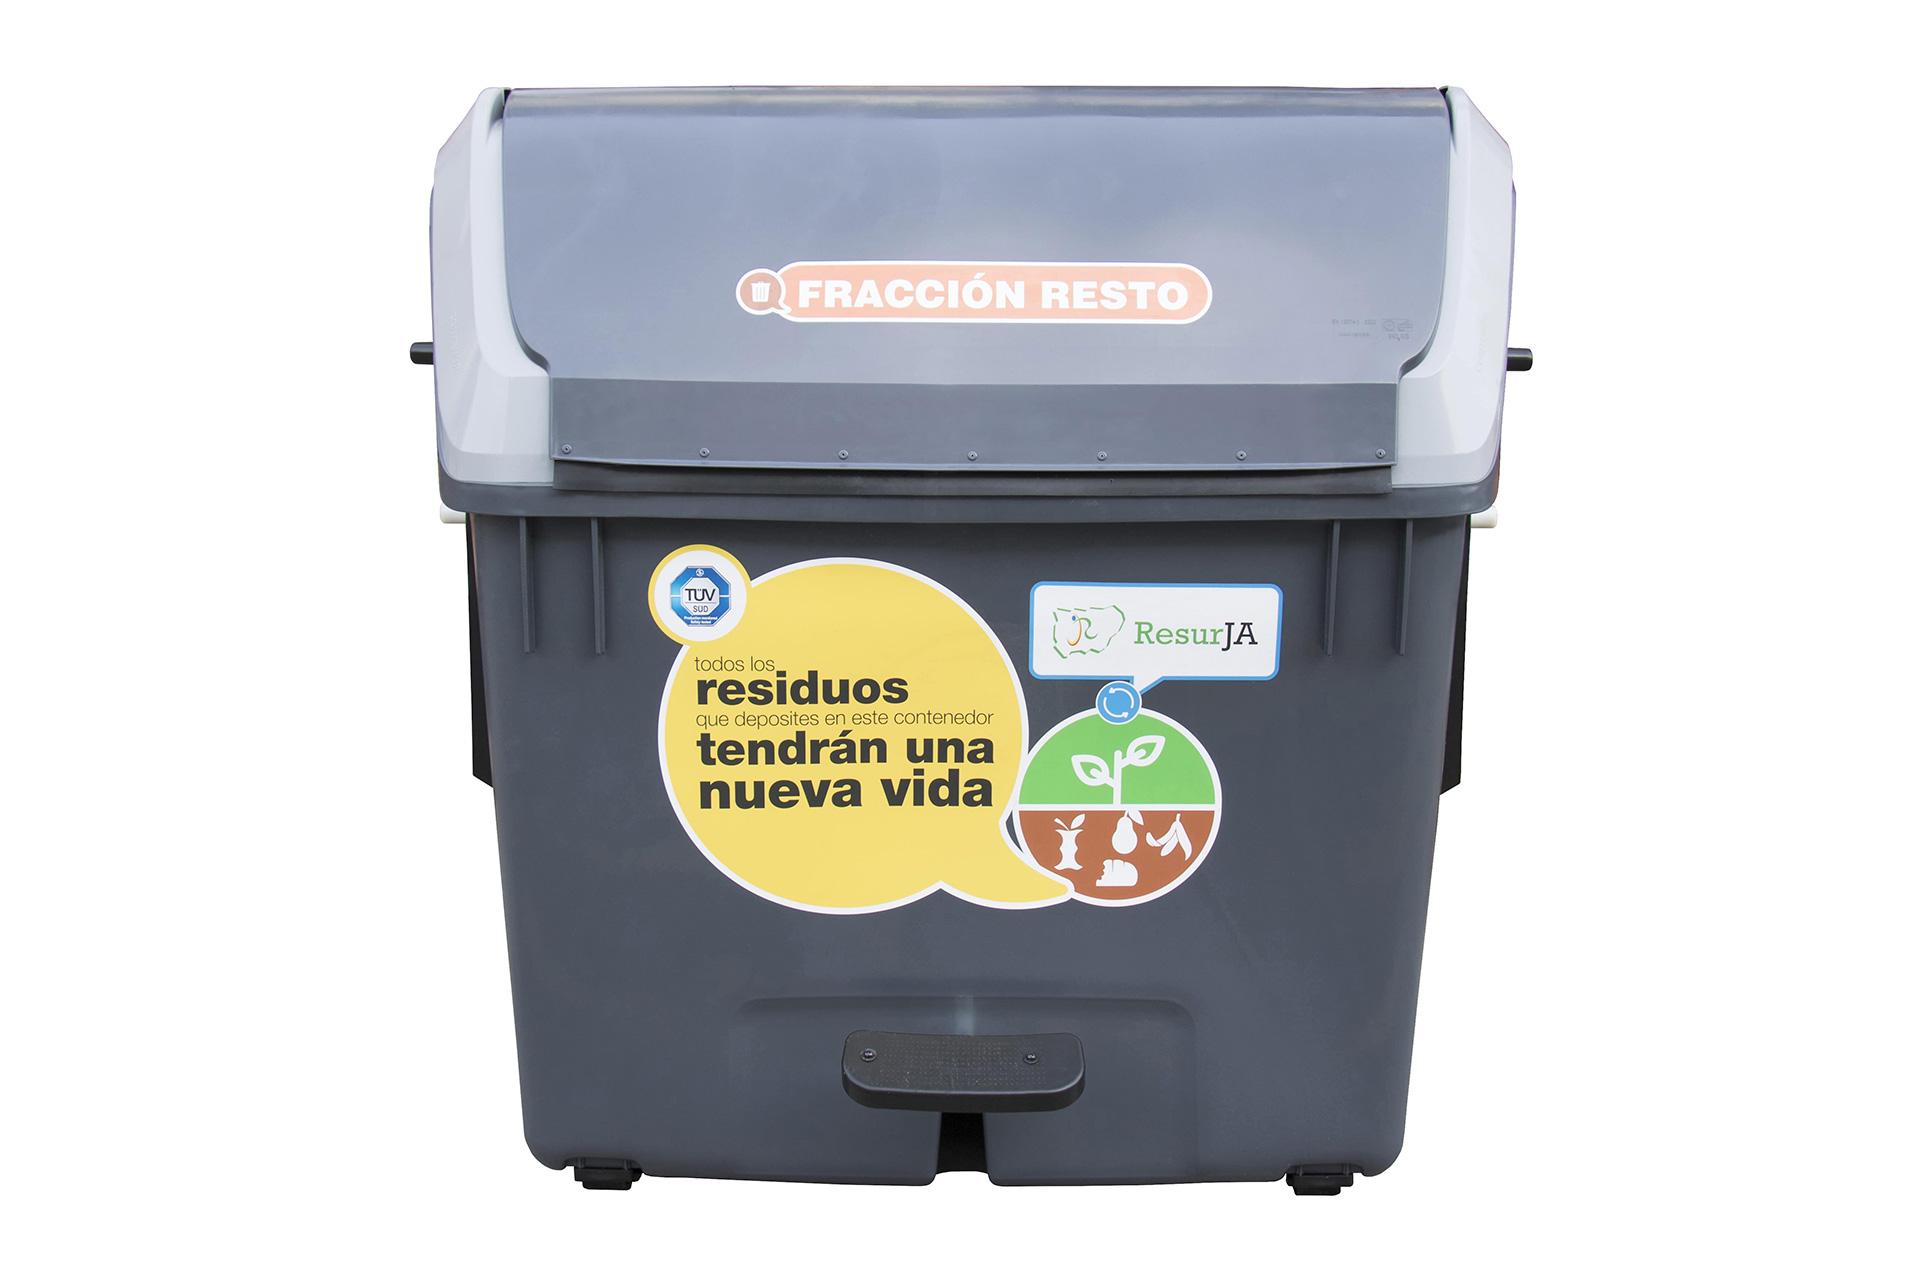 Customisation with sticker